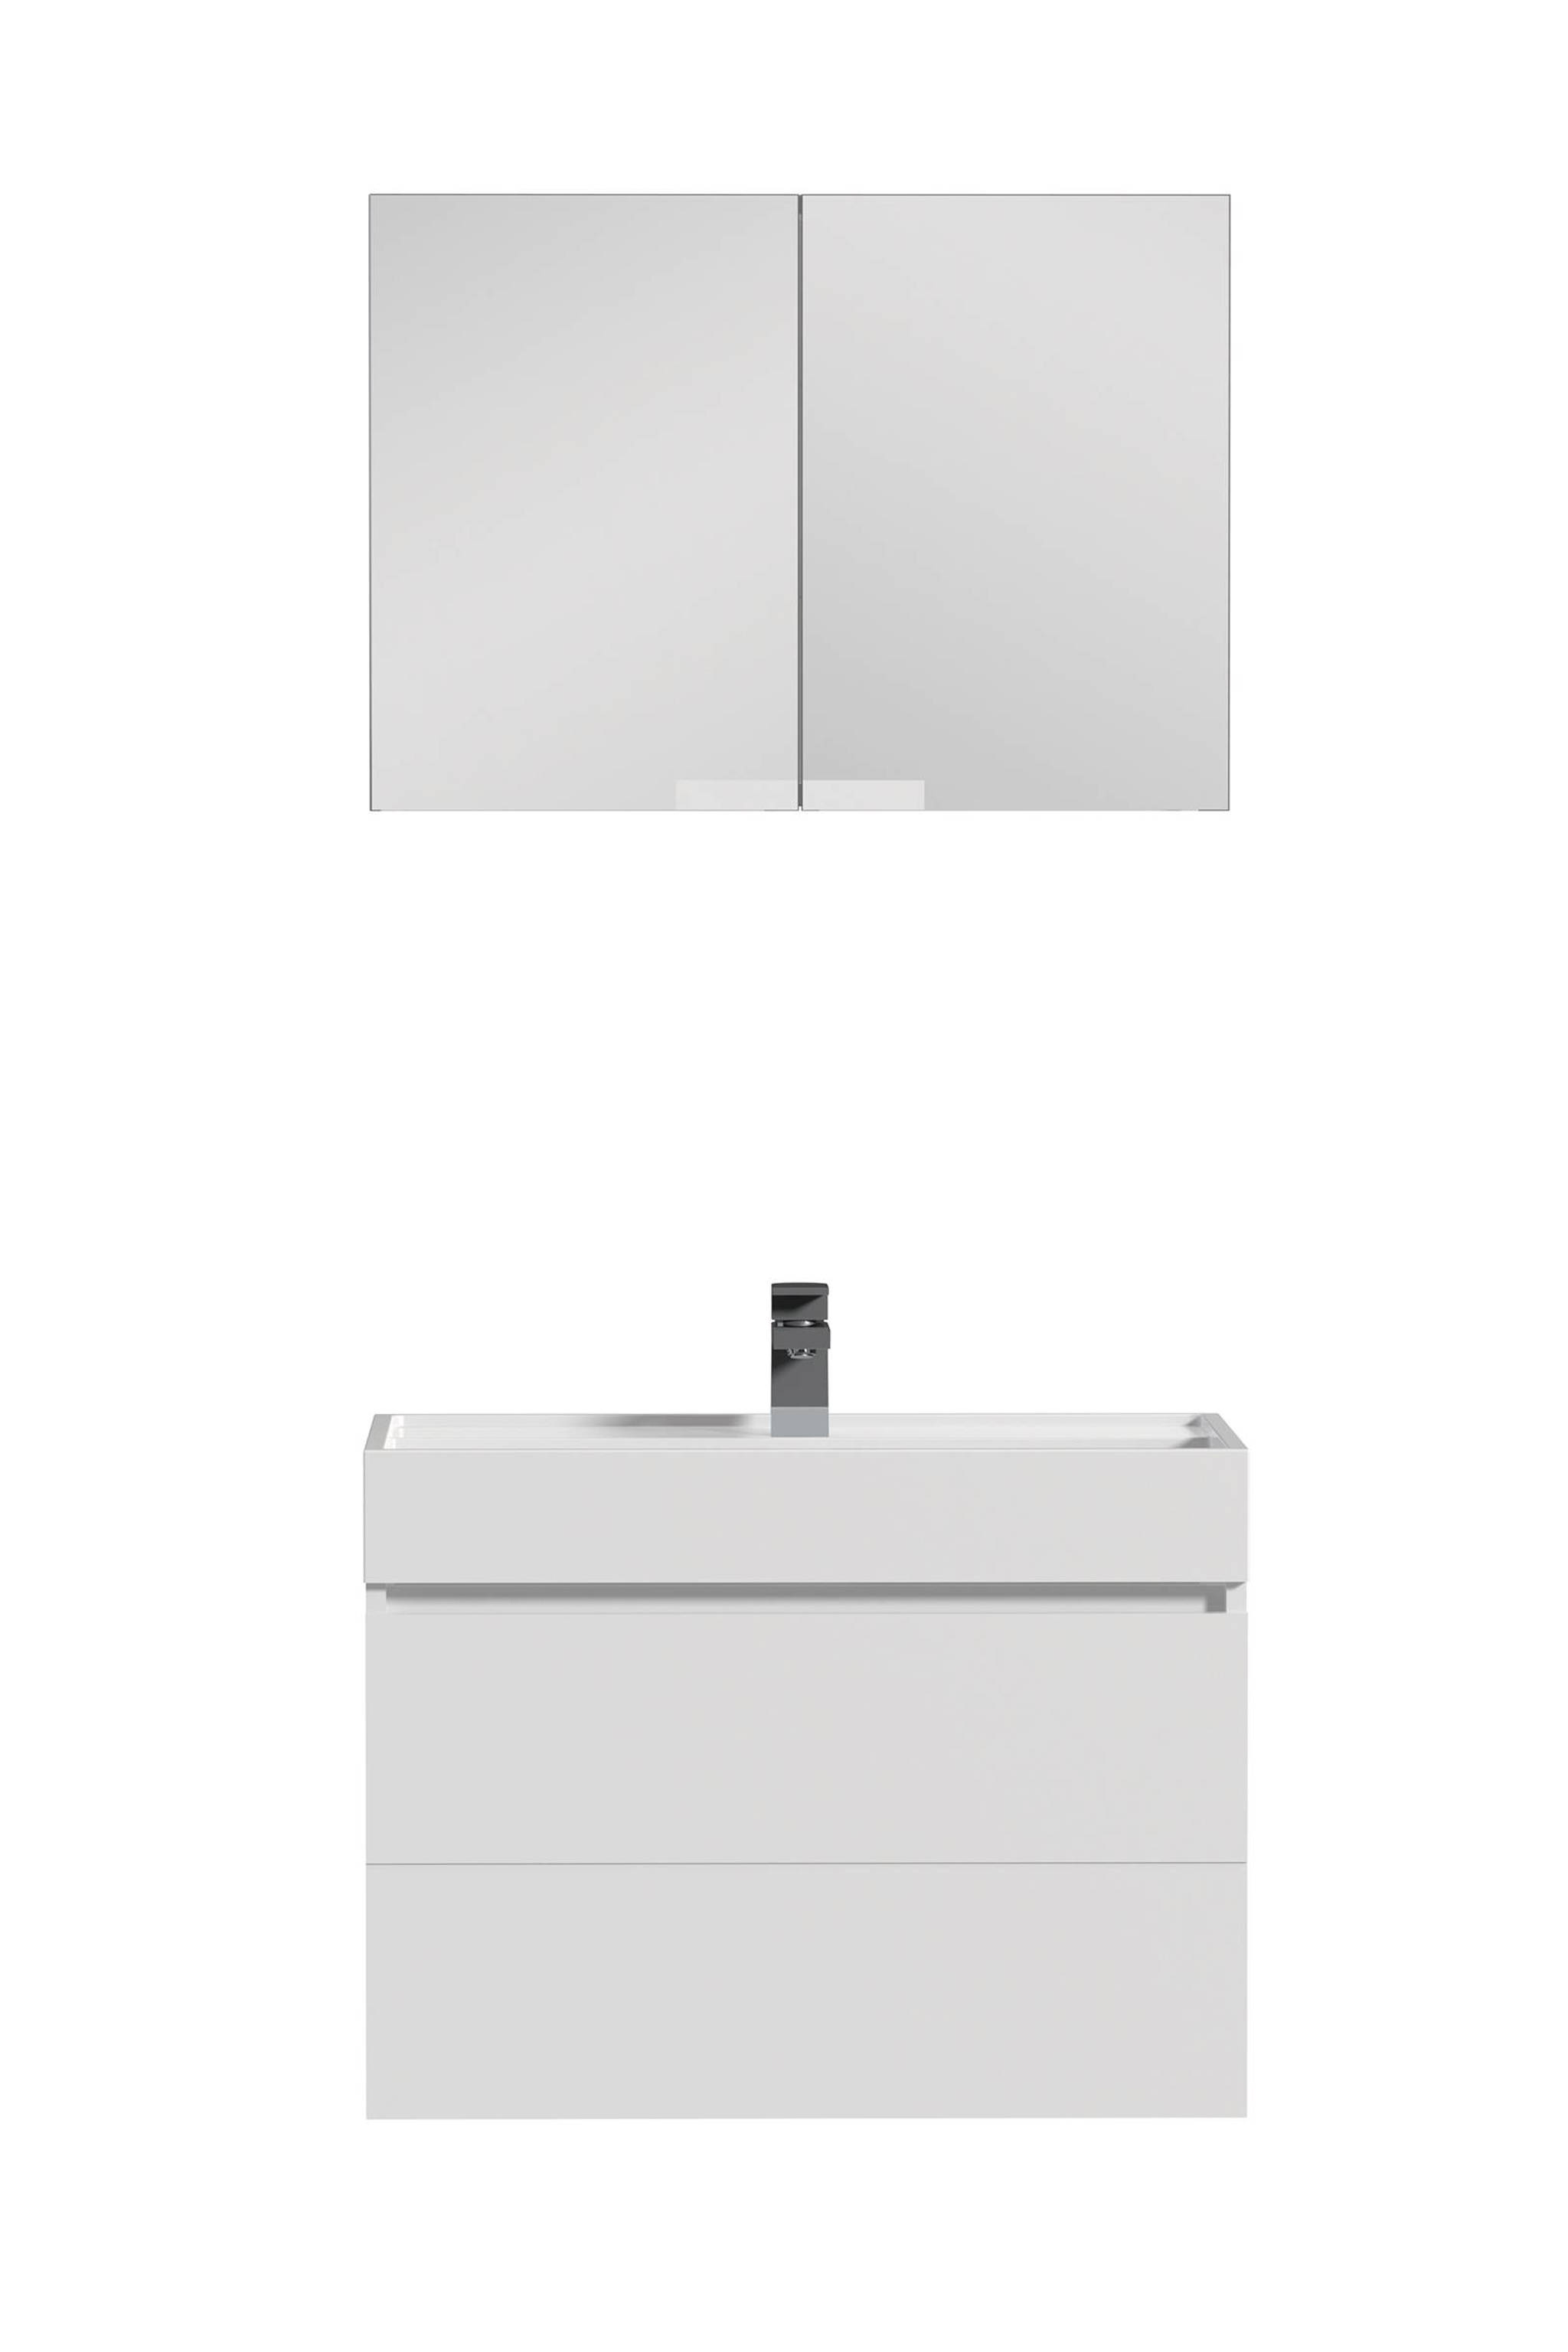 Tiger Items badkamermeubel 70cm met spiegelkast en wit polybeton wastafel